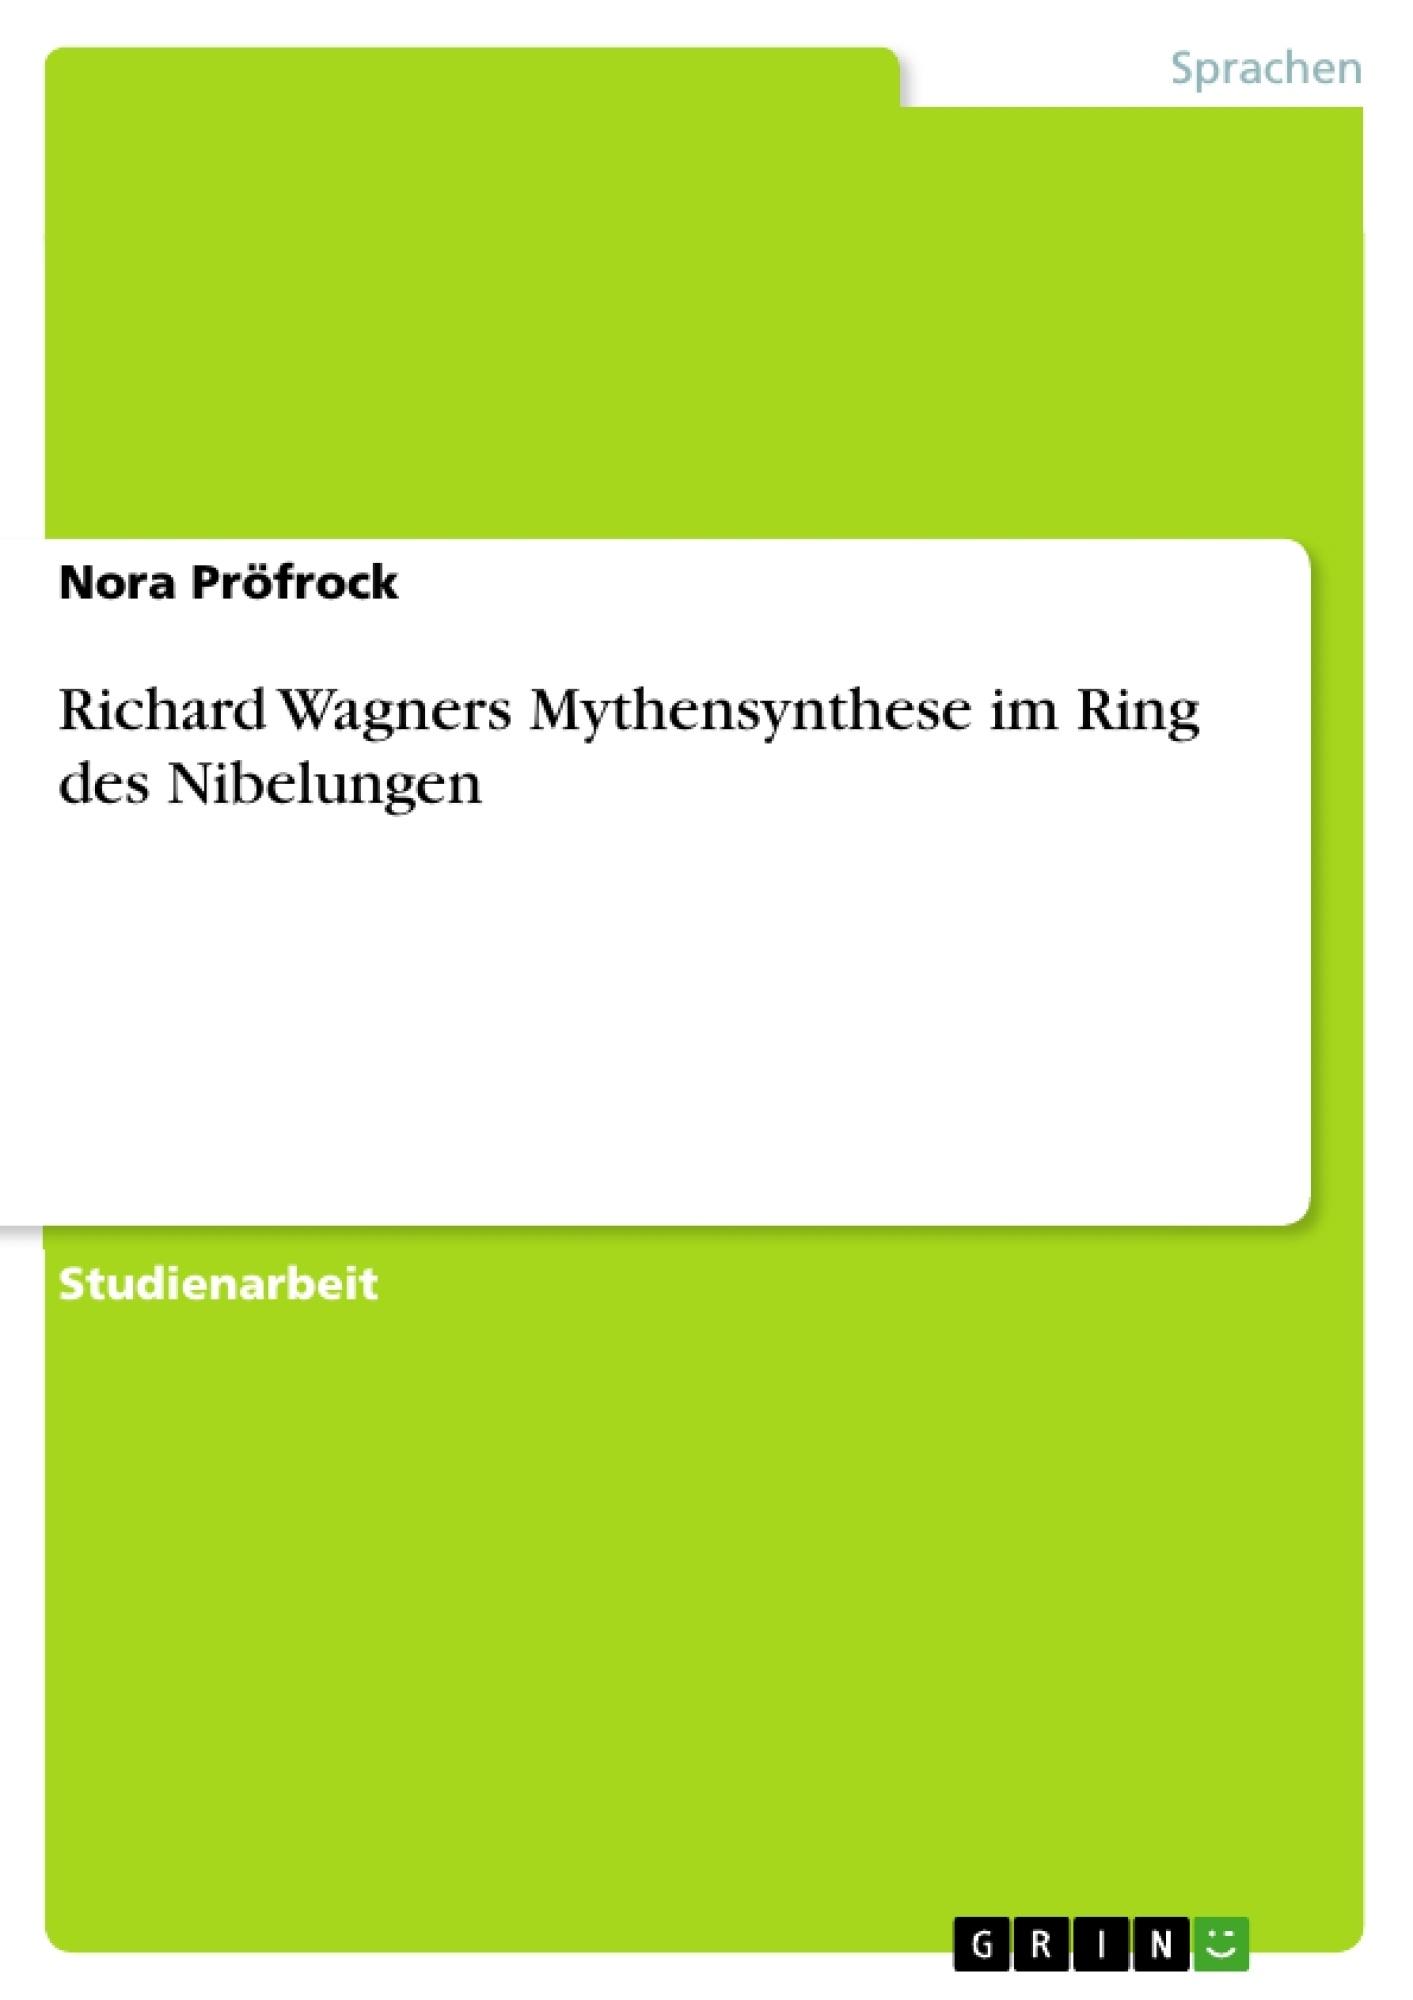 Titel: Richard Wagners Mythensynthese im Ring des Nibelungen